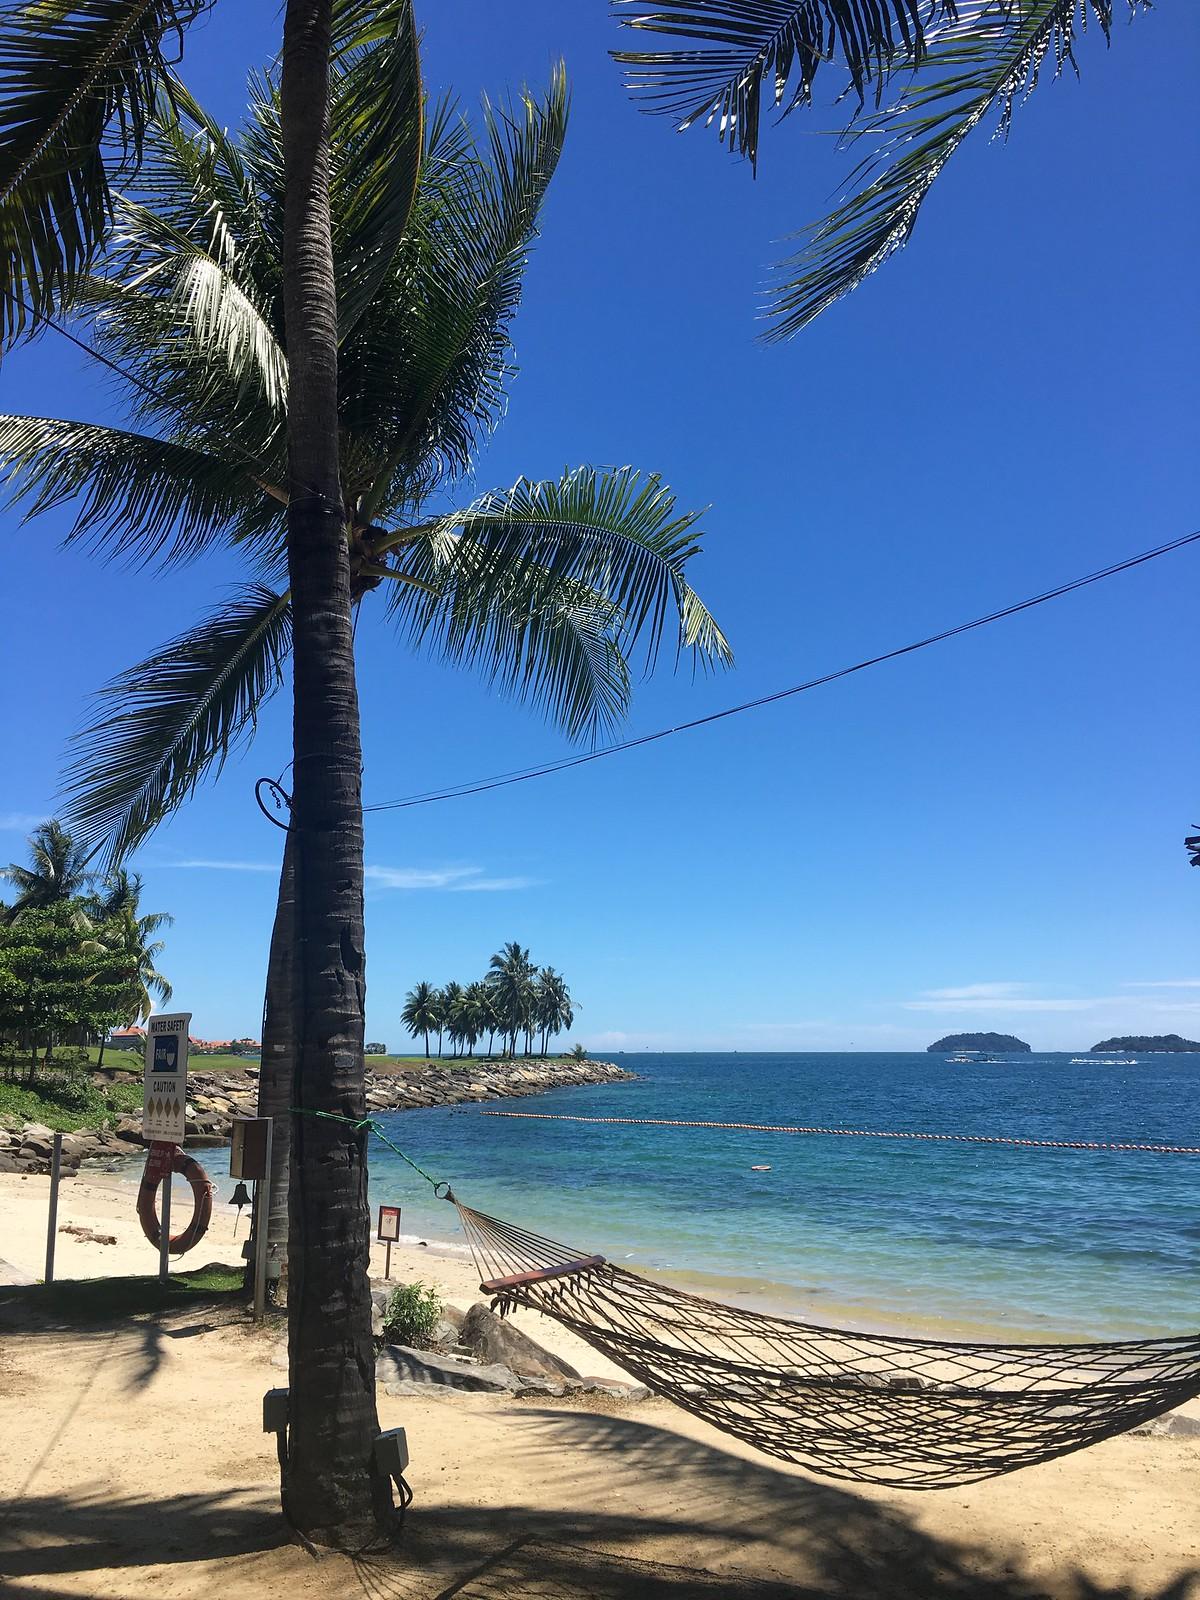 The Pacific Sutera Kota Kinabalu